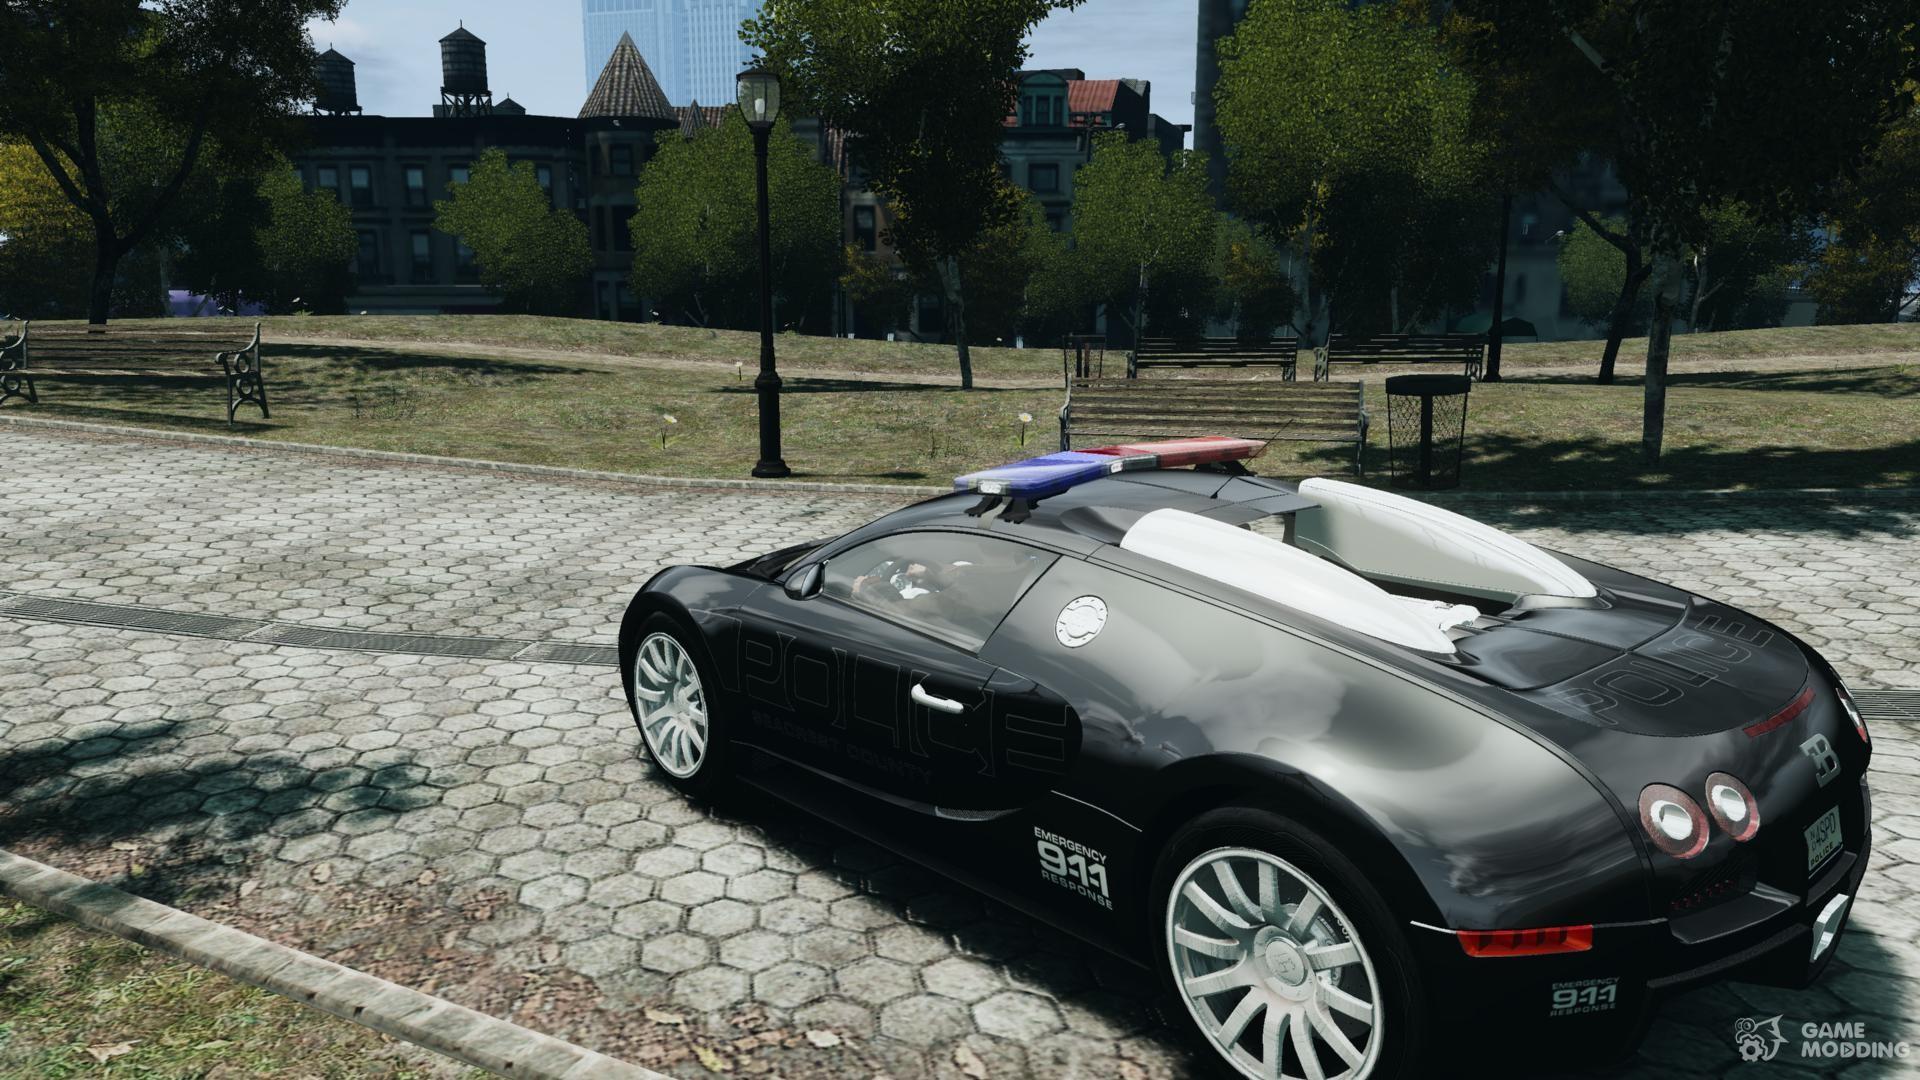 668307cdefa4760f0480214dc40badbd306cf58ec525cd7f4c0d5bc70fc026ec Wonderful Bugatti Veyron Xbox 360 Games Cars Trend